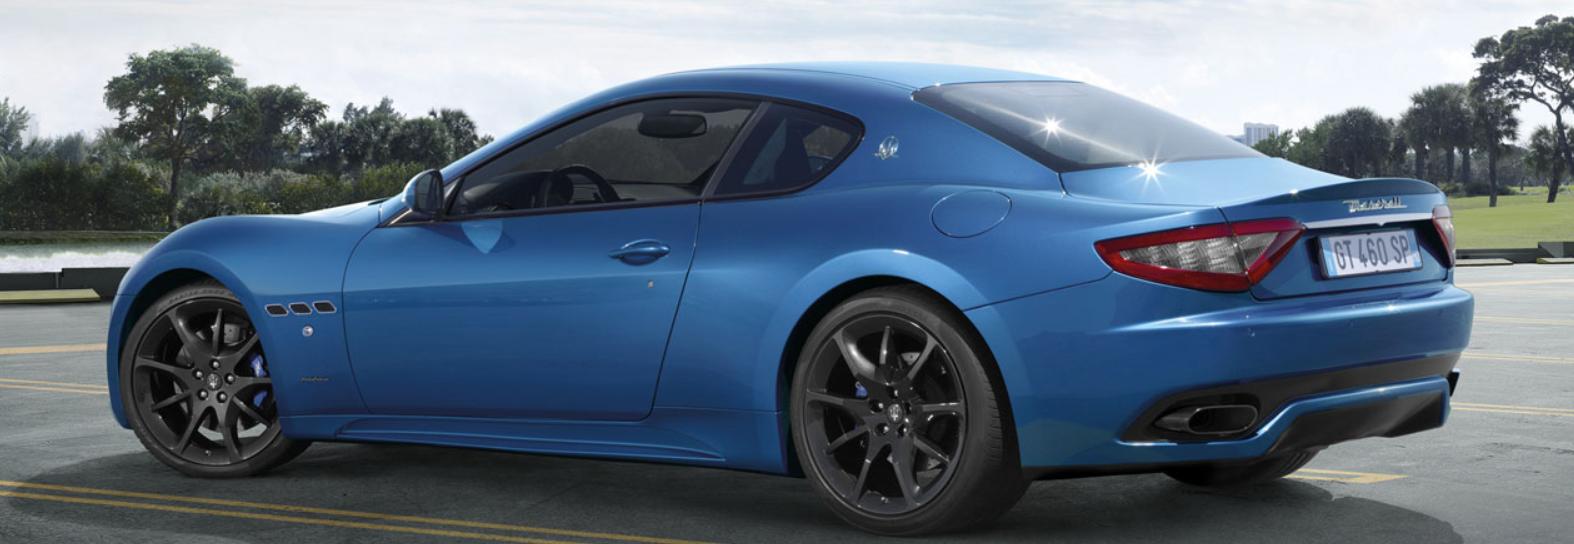 Maserati_GranTurismo_Sport-ด้านข้าง